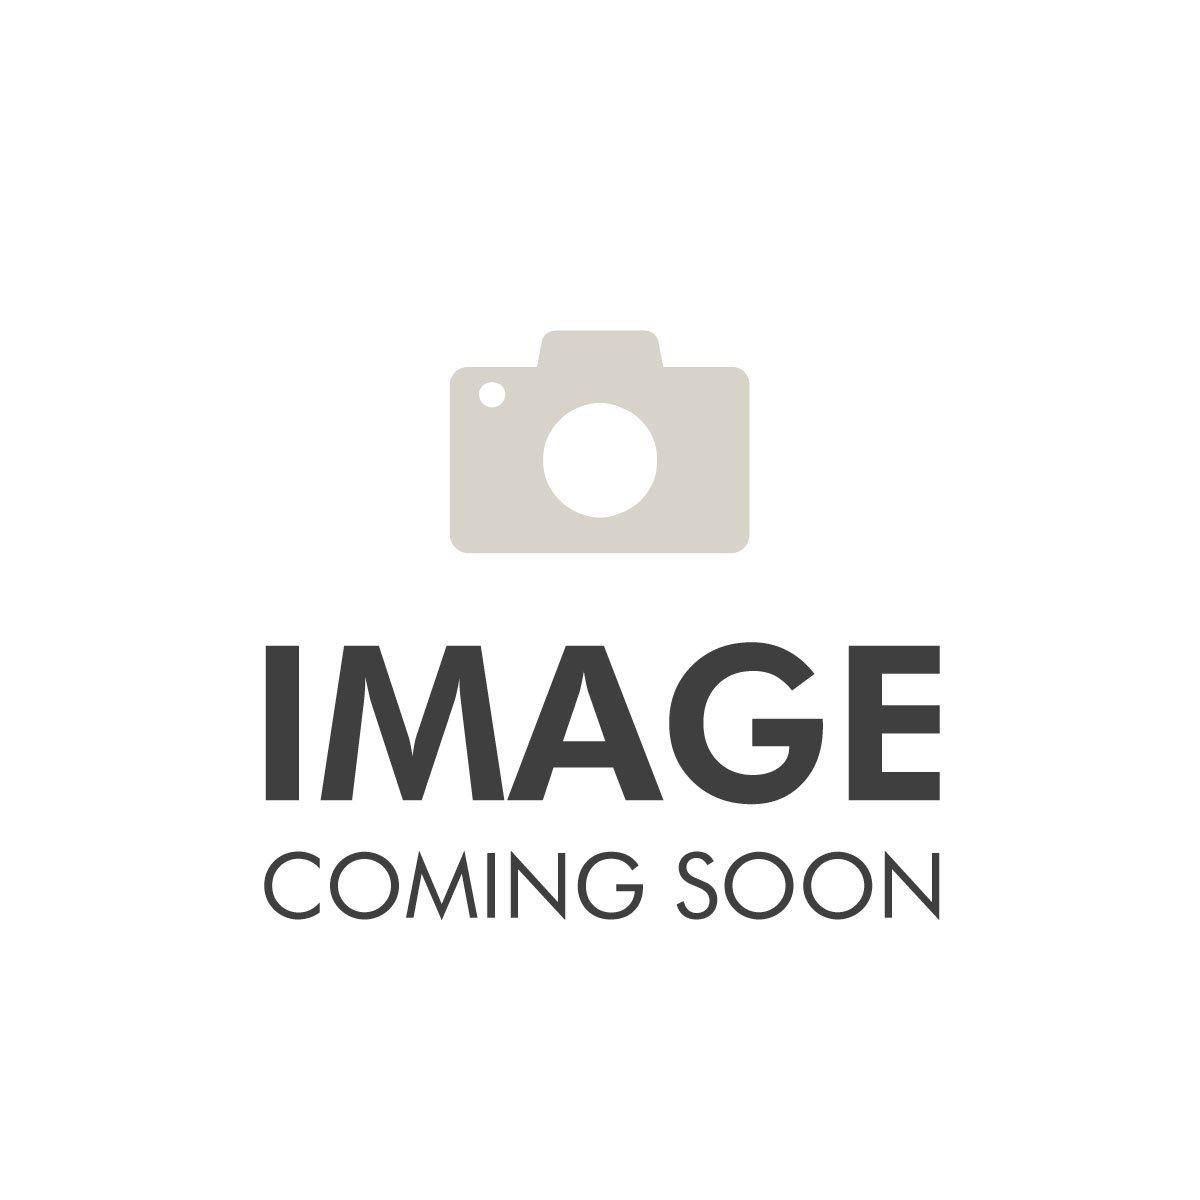 Salvador Dali Ruby Lips 3G Solid Perfume / 20G Perfumed Soap